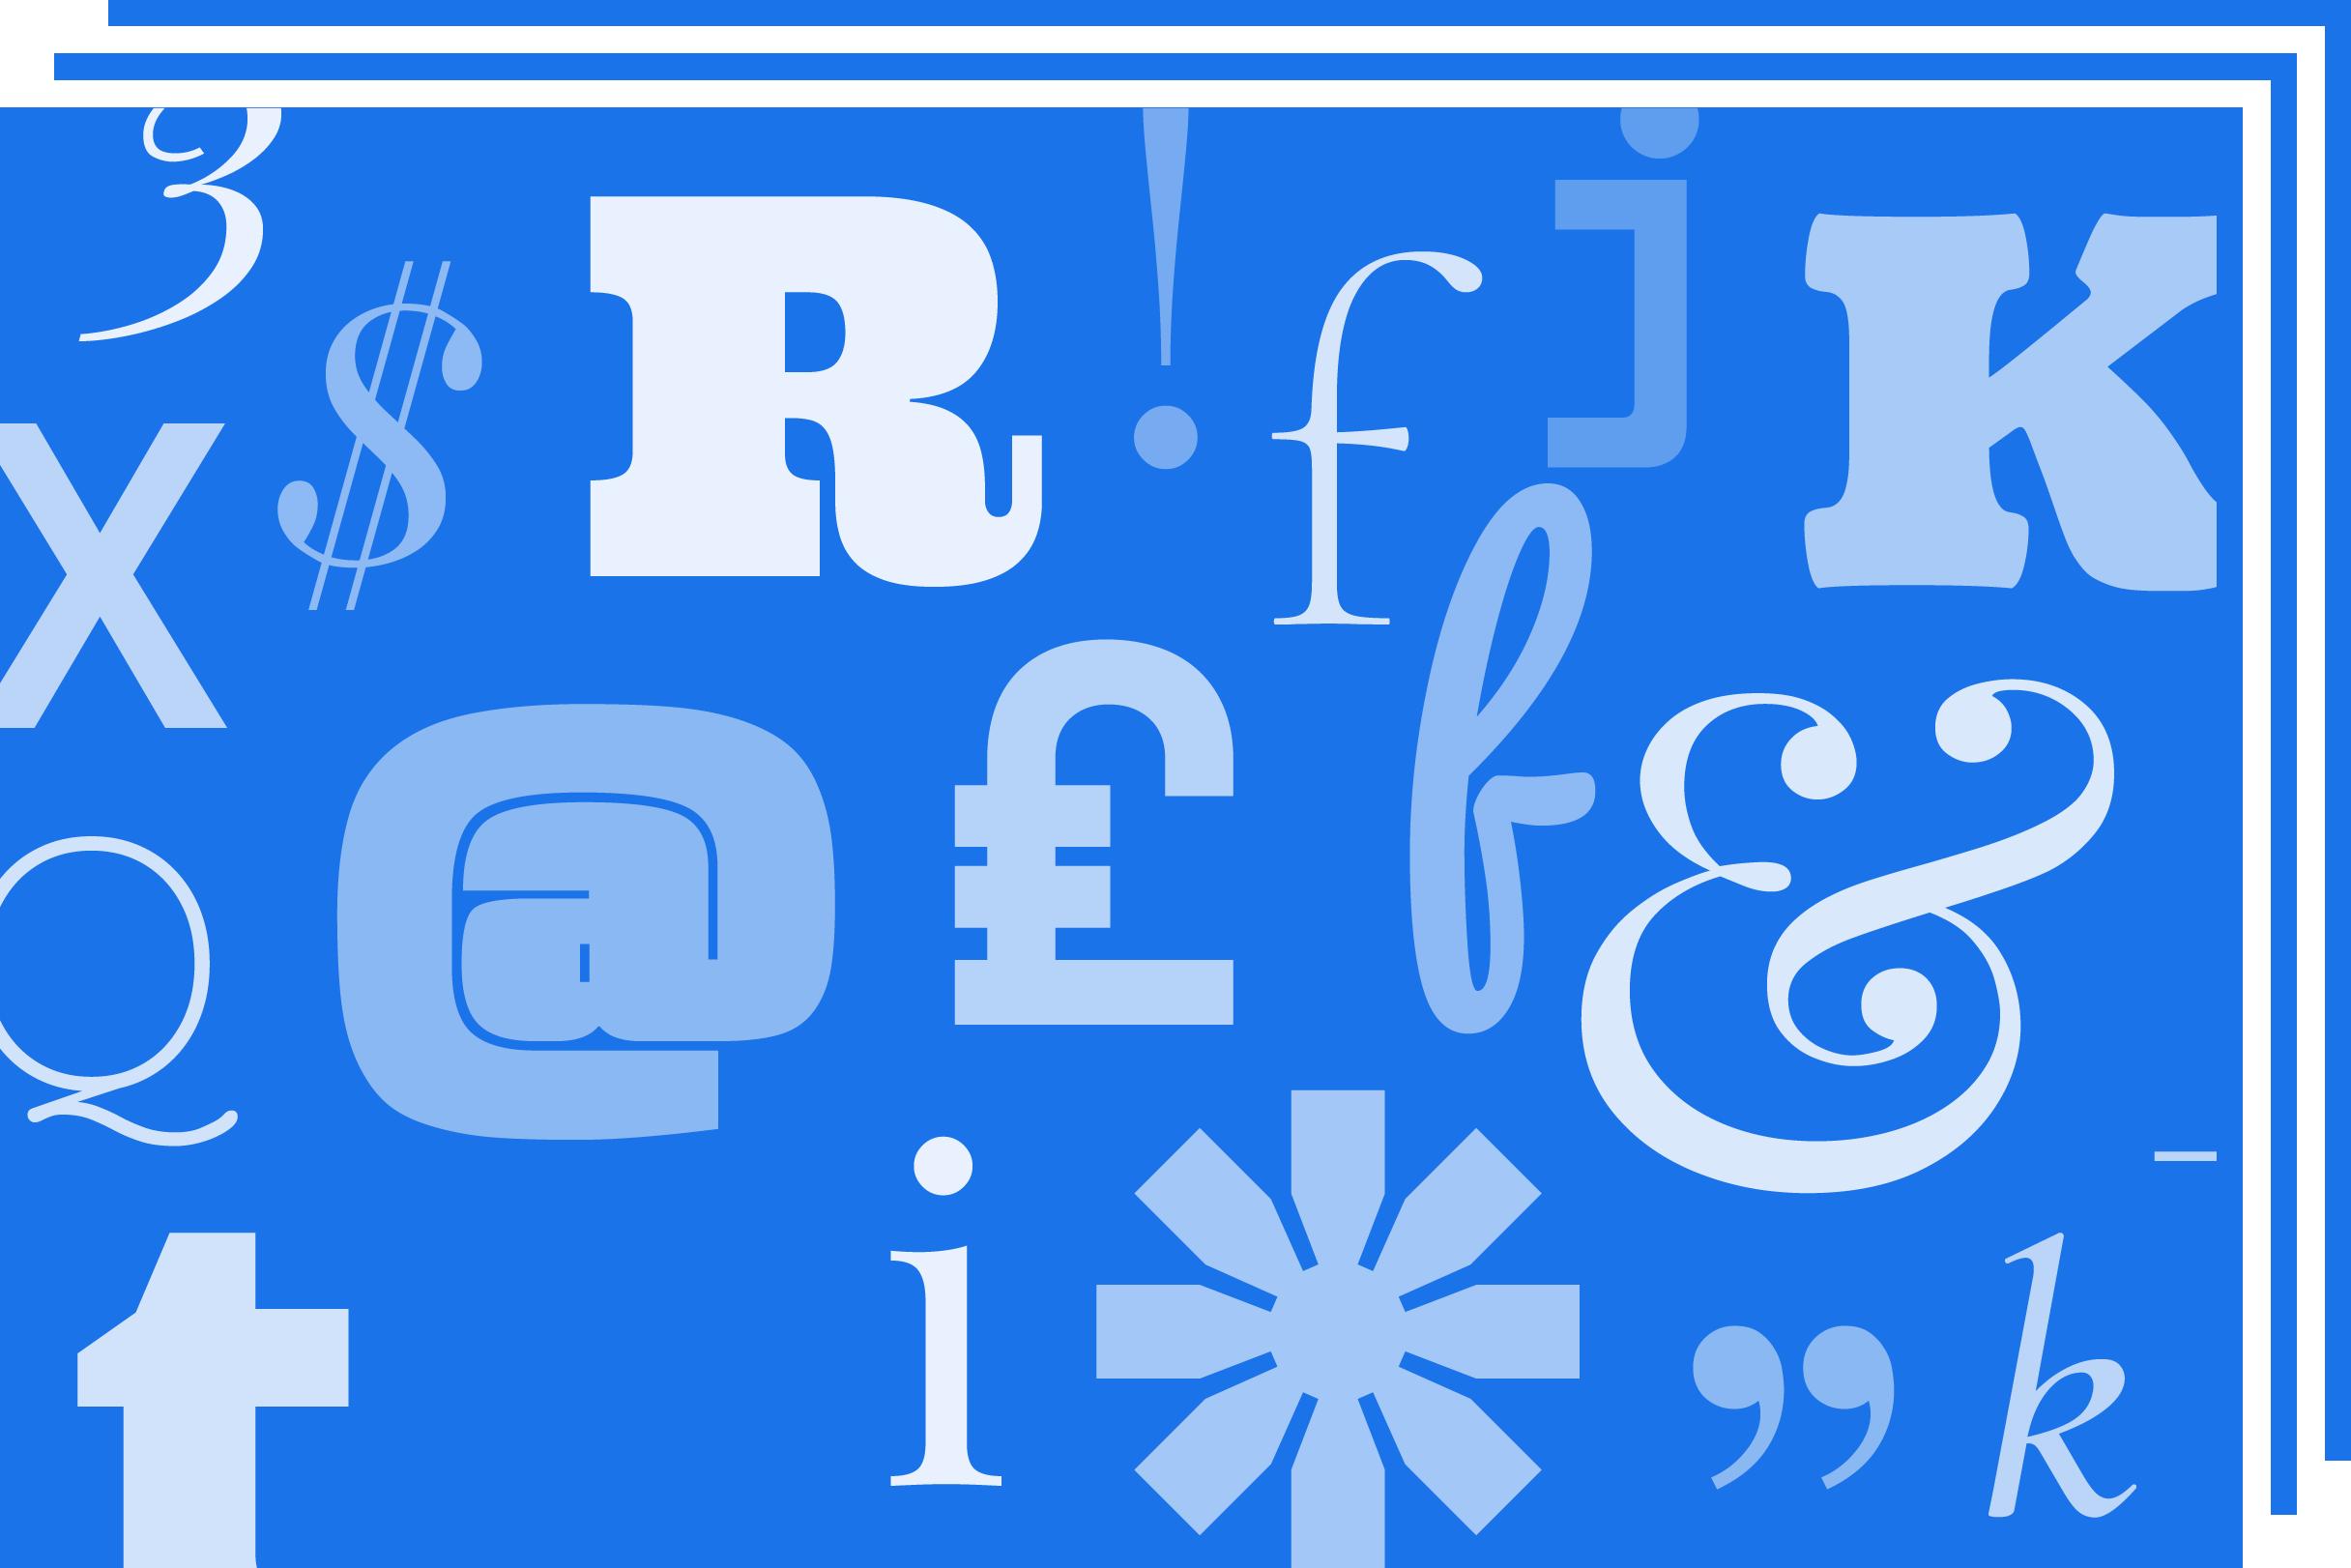 How to change fonts on Instagram | Font generator for Instagram